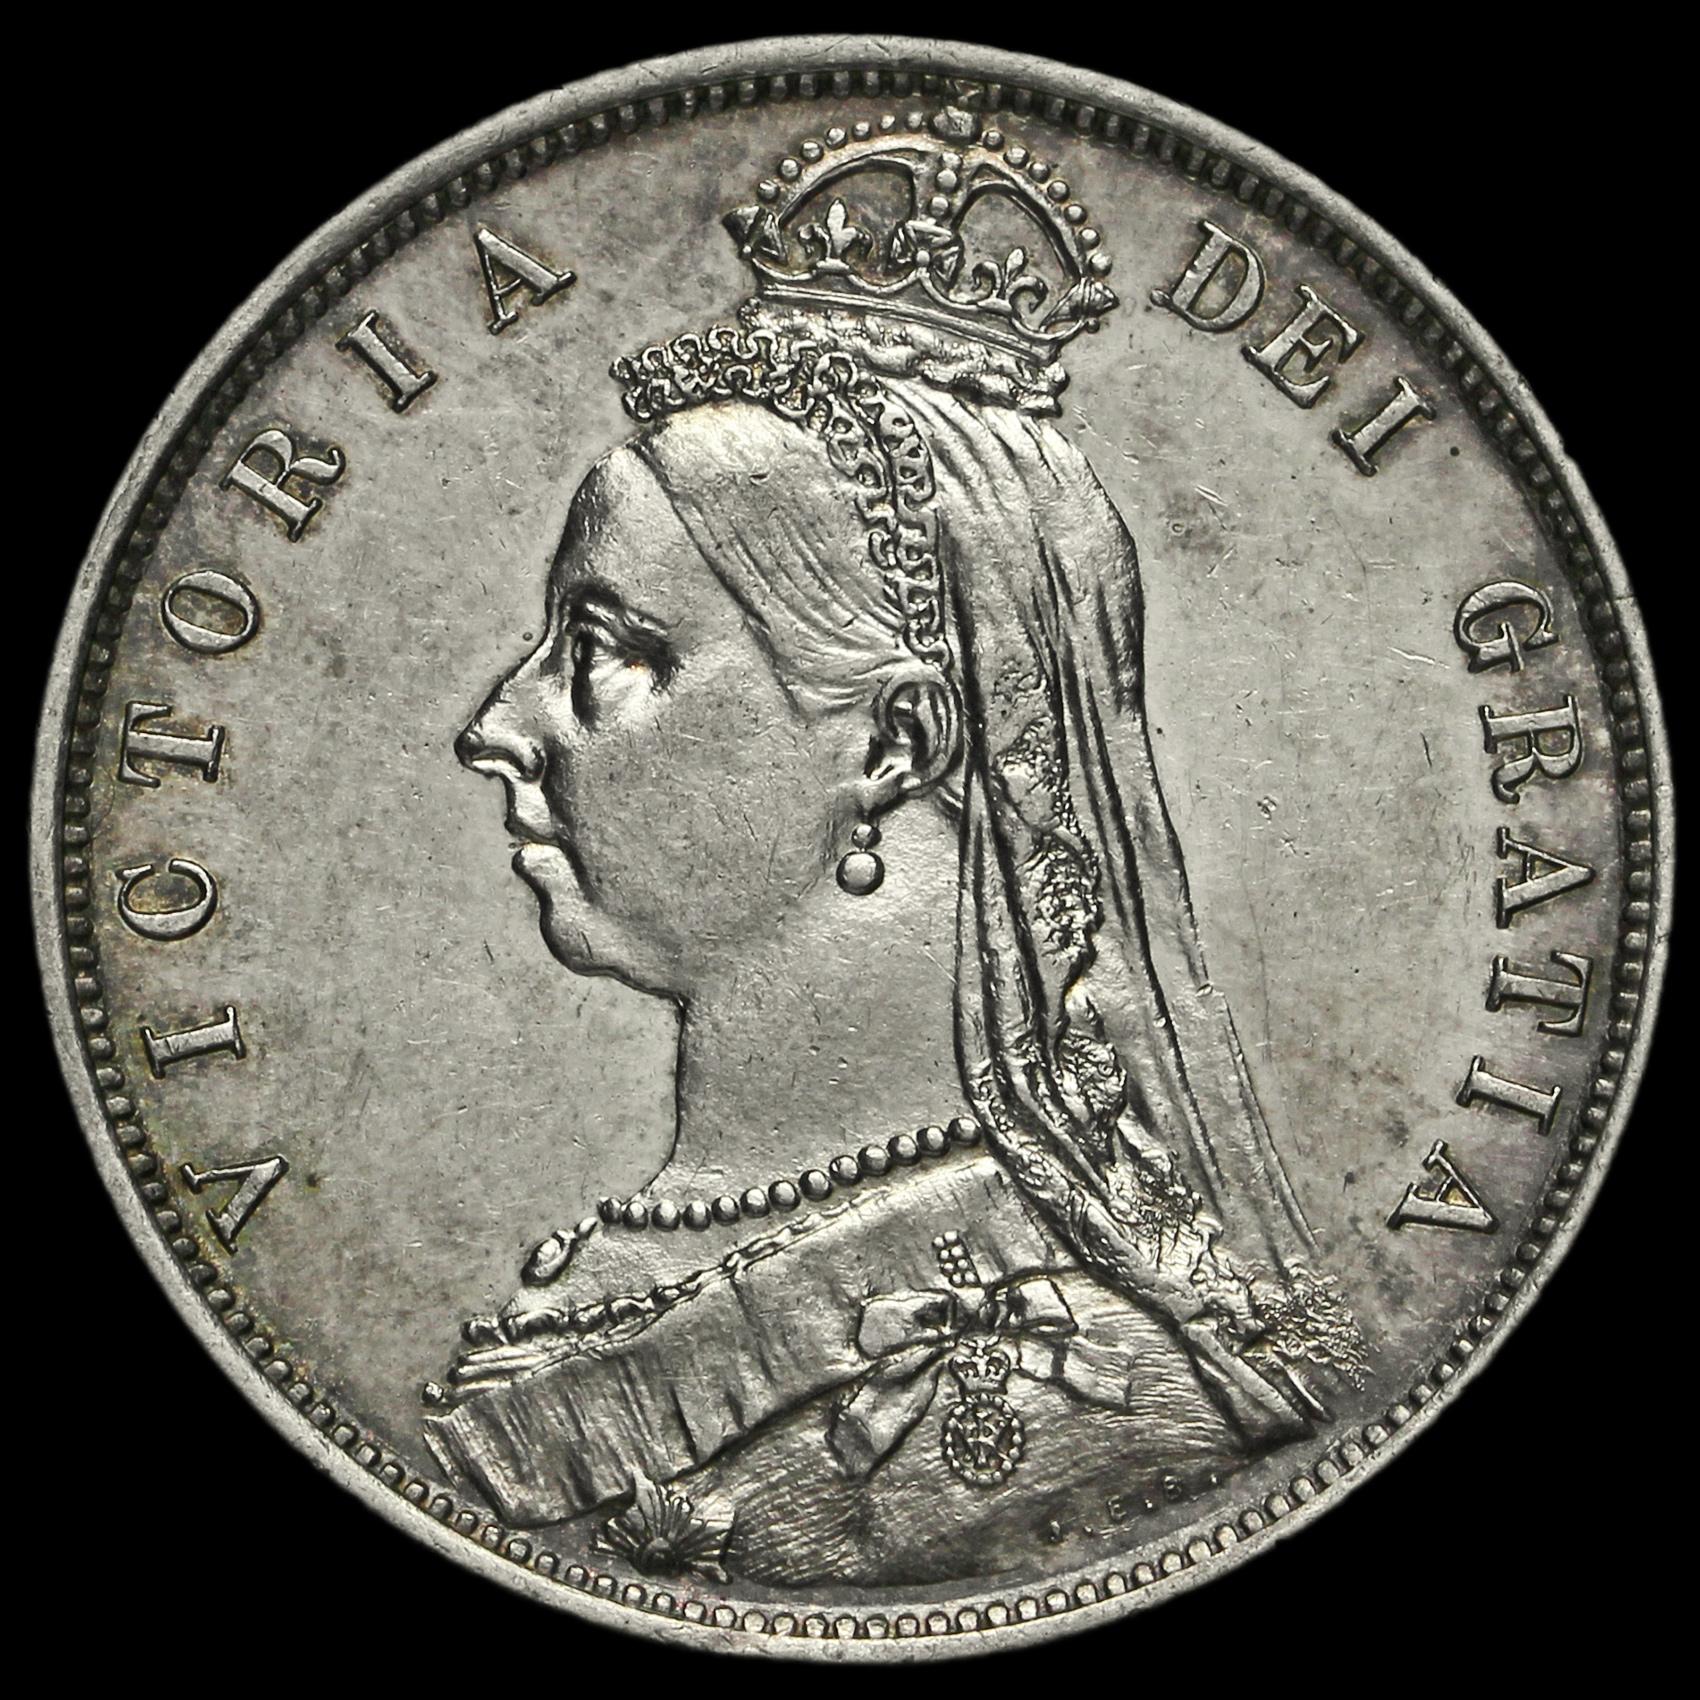 1887 Queen Victoria Jubilee Head Silver Half Crown, Near EF